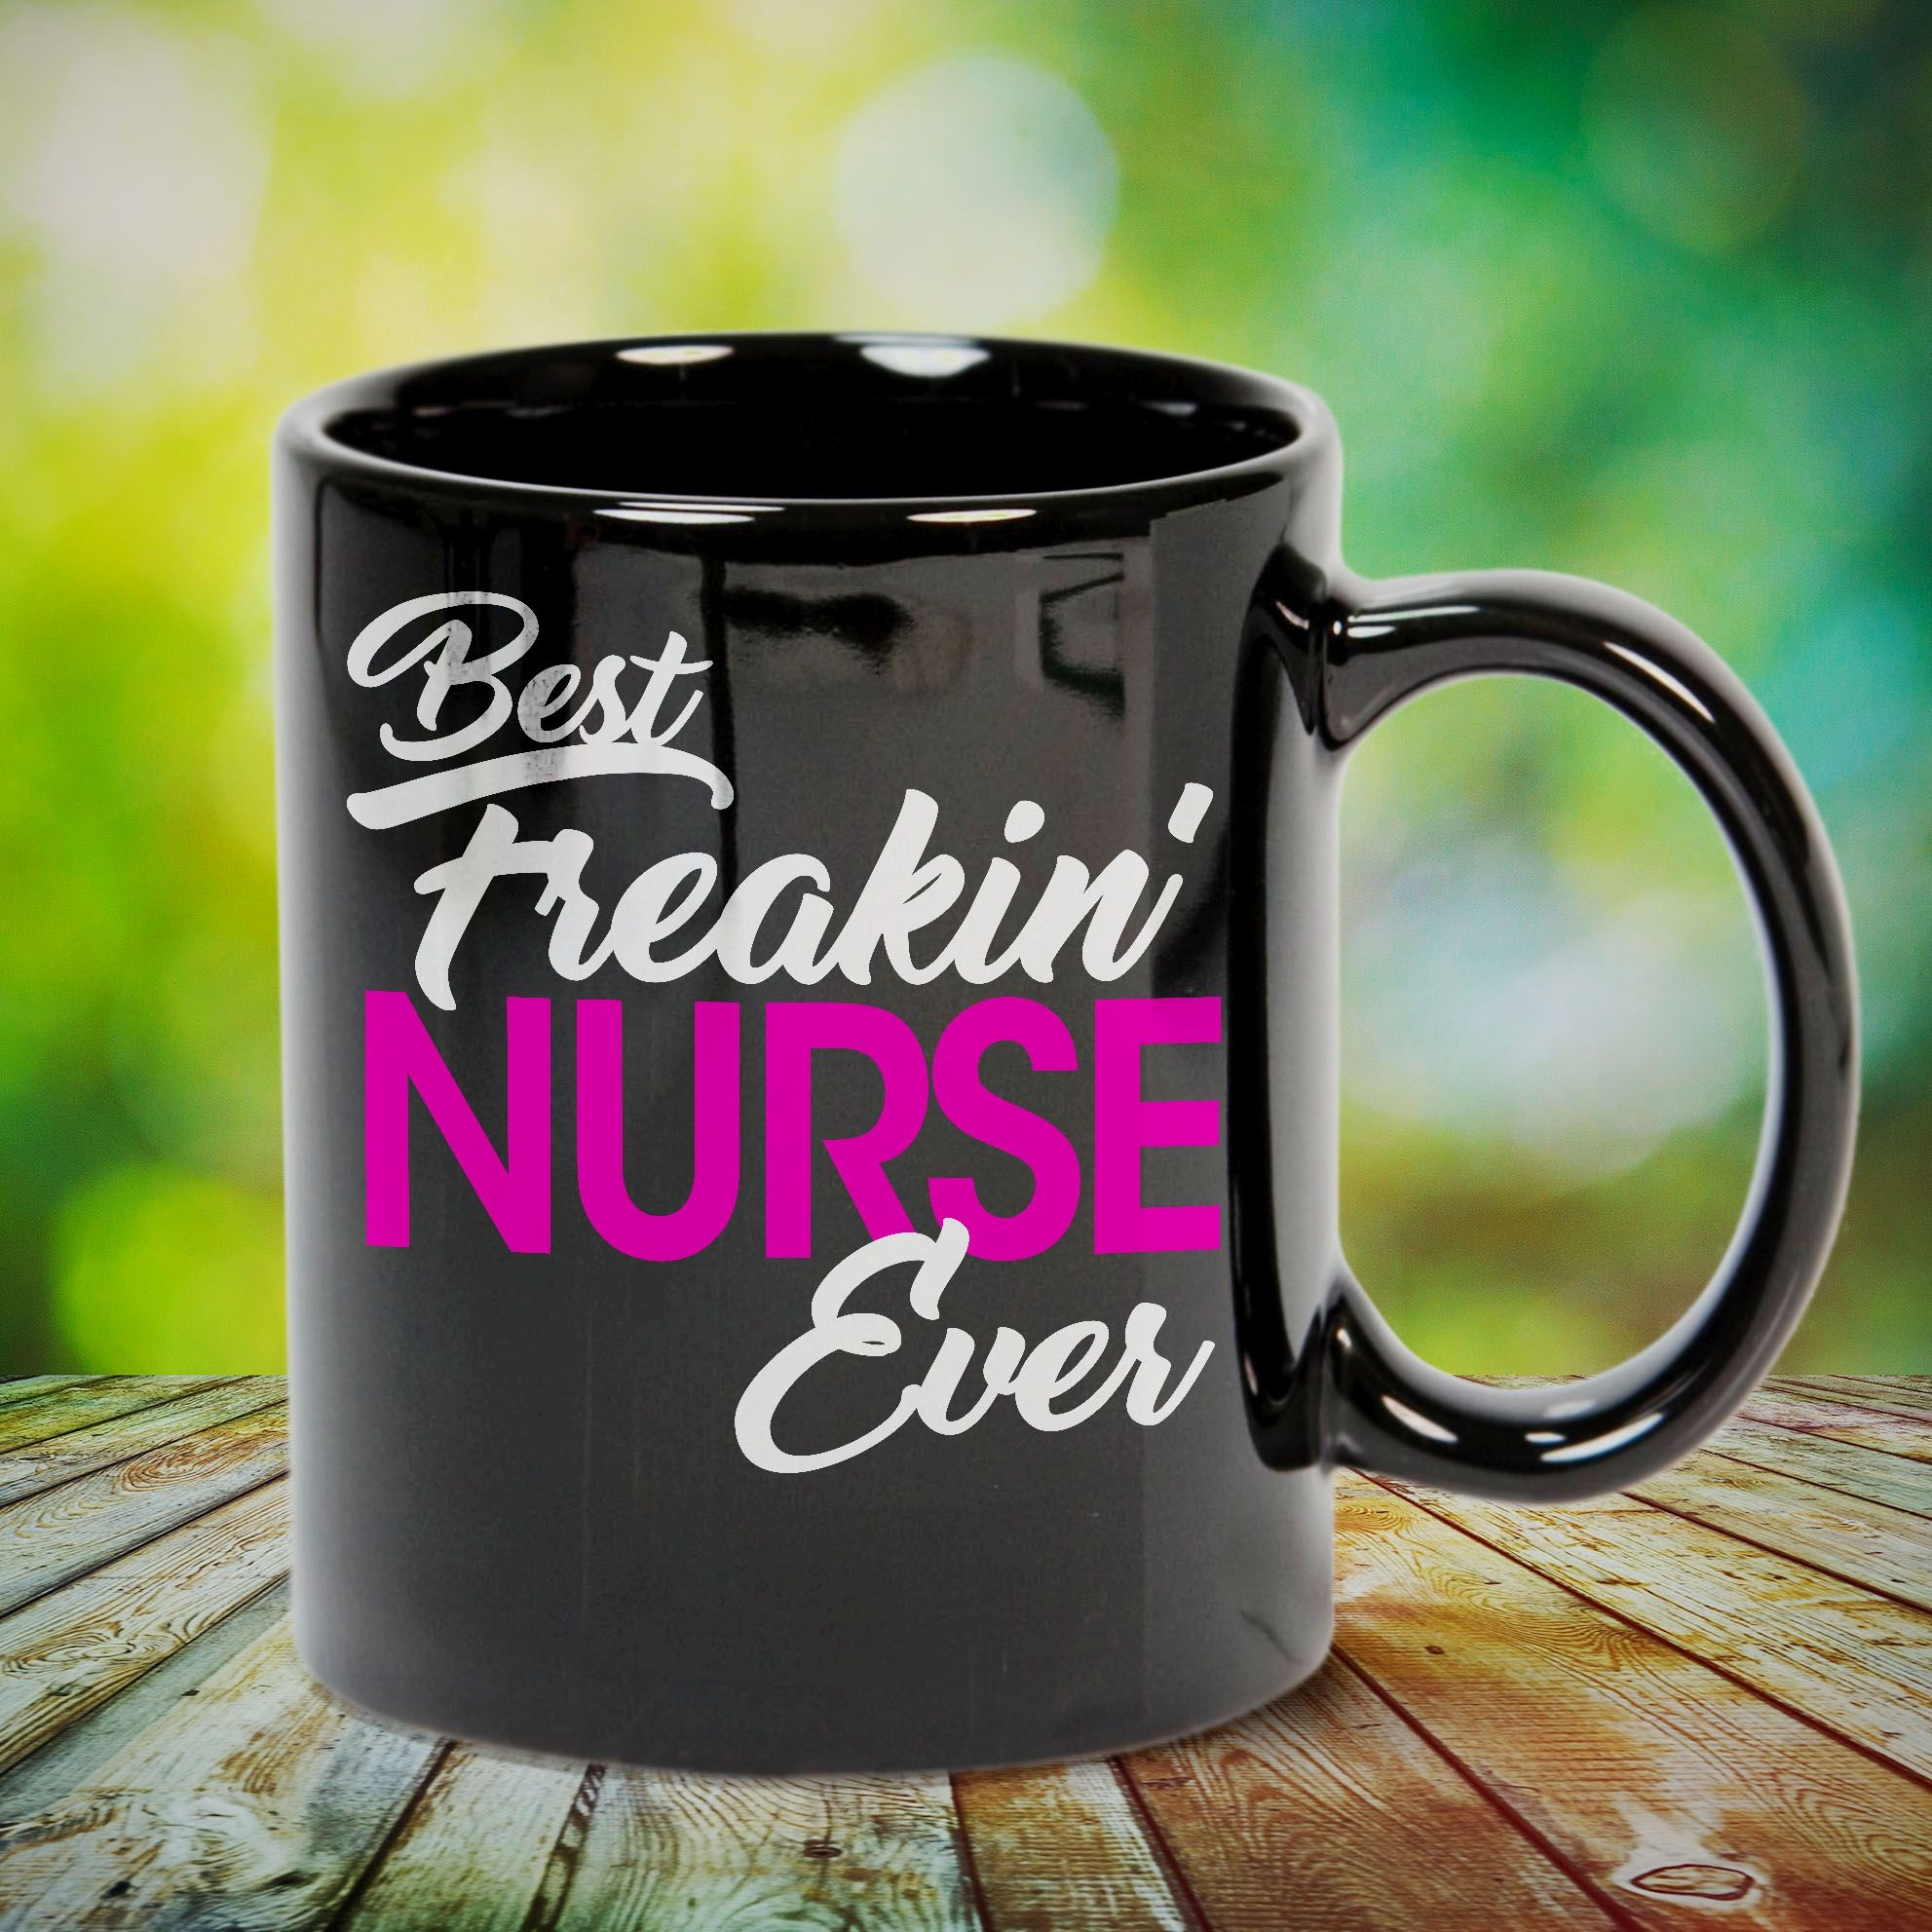 Best freaking nurse ever this cute tee shirtmug is a